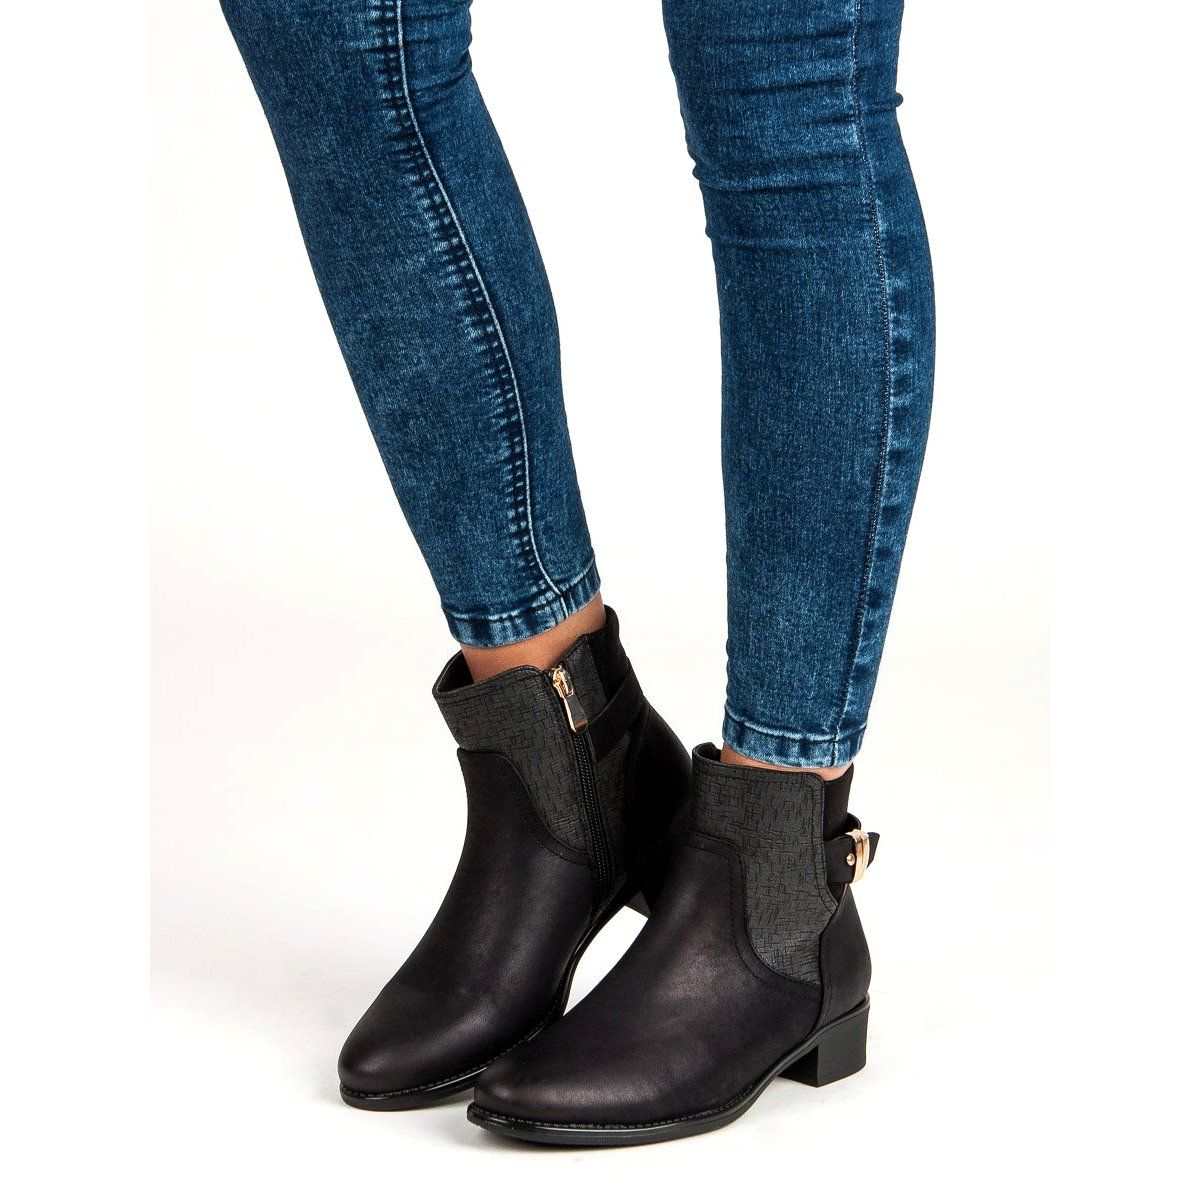 Vinceza Damskie Jesienne Botki Czarne Chelsea Boots Ankle Boot Shoes